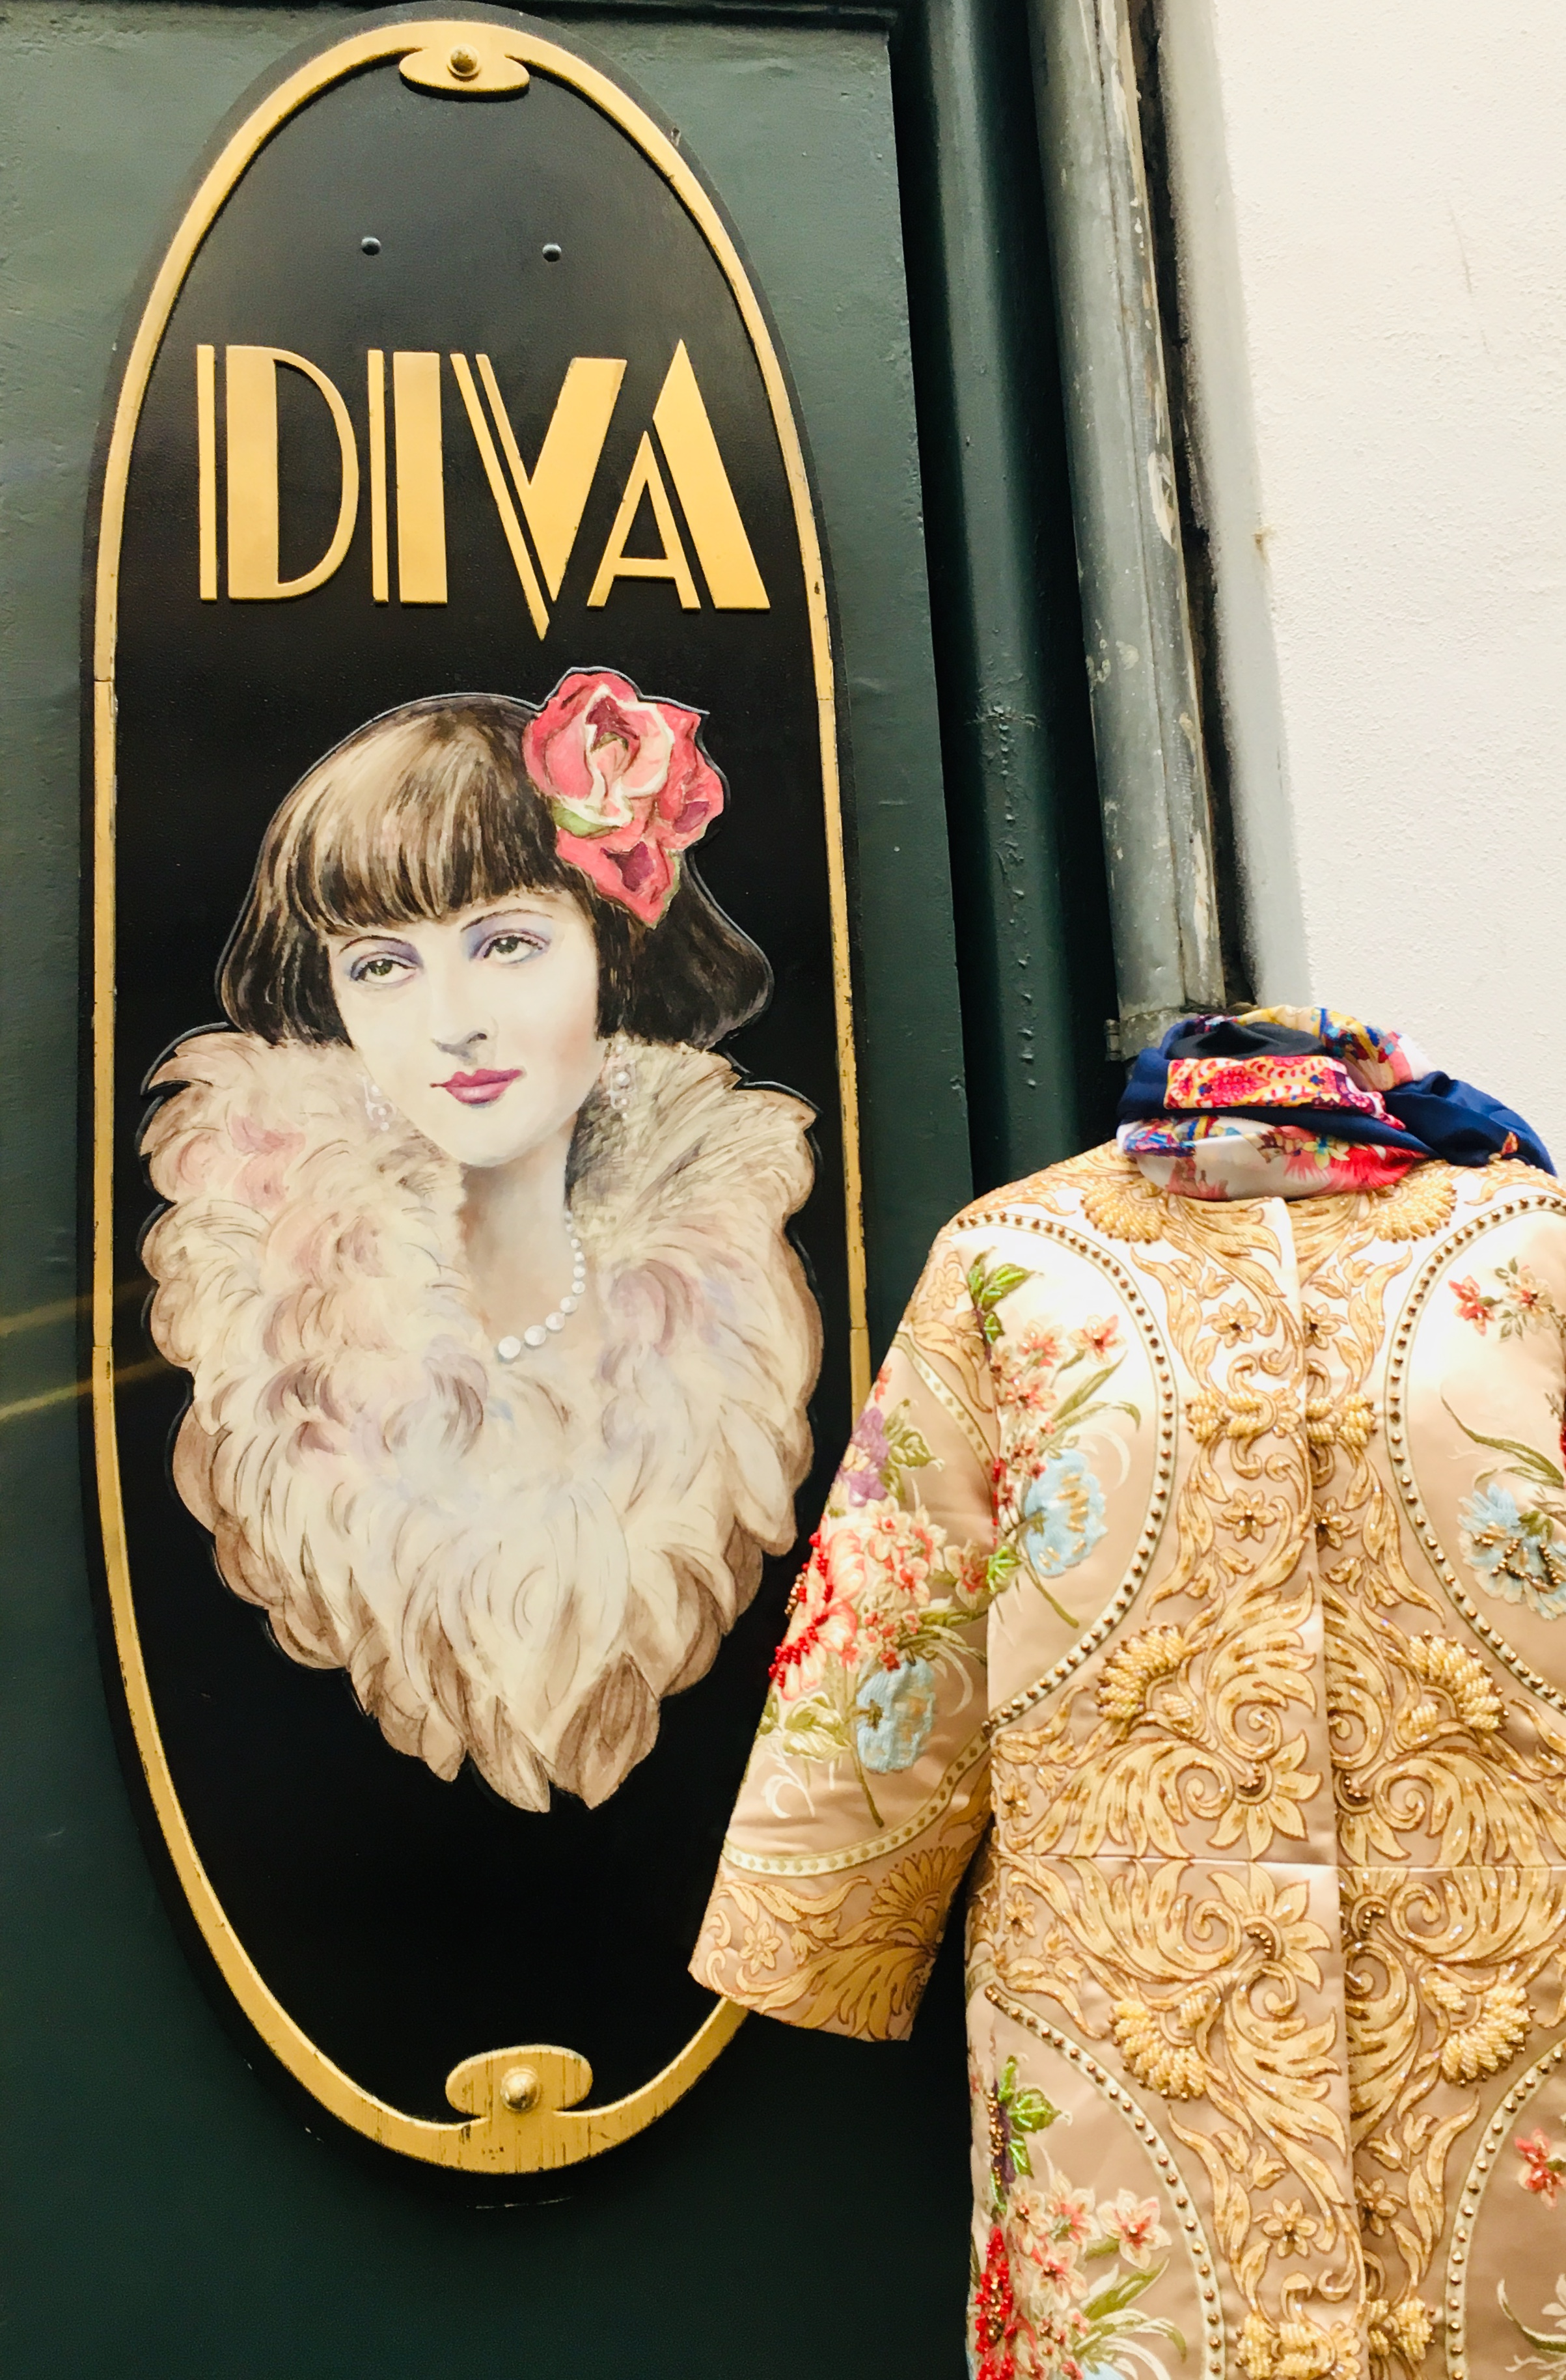 EP's Diva: From Scraps to Splendor